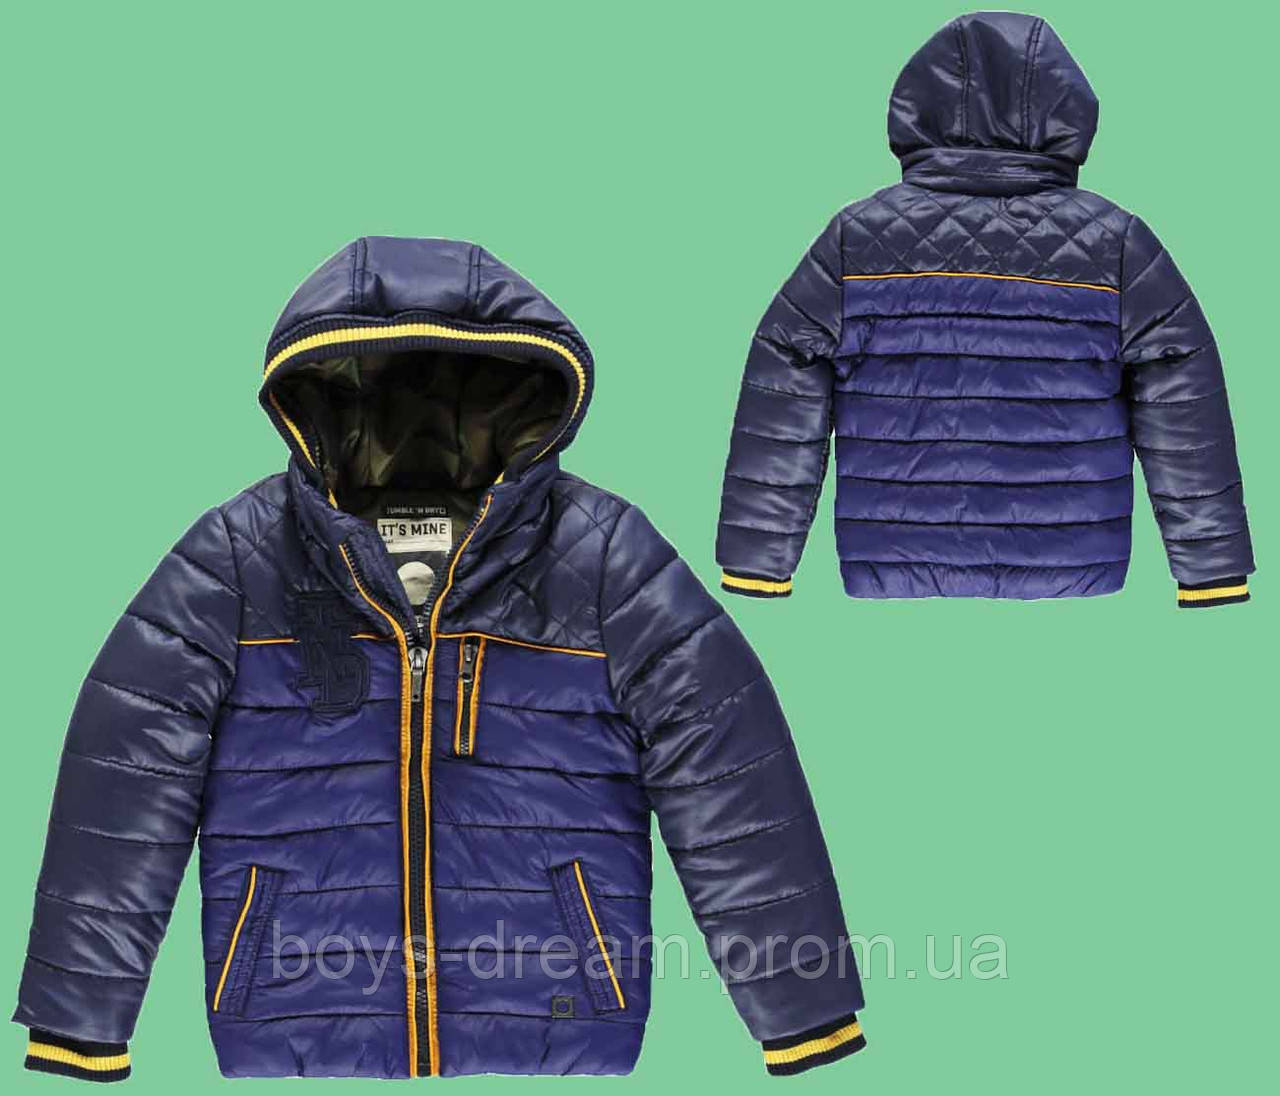 Зимняя куртка на мальчика 2-10 лет ( 98-140 ) Tumble'n Dry.